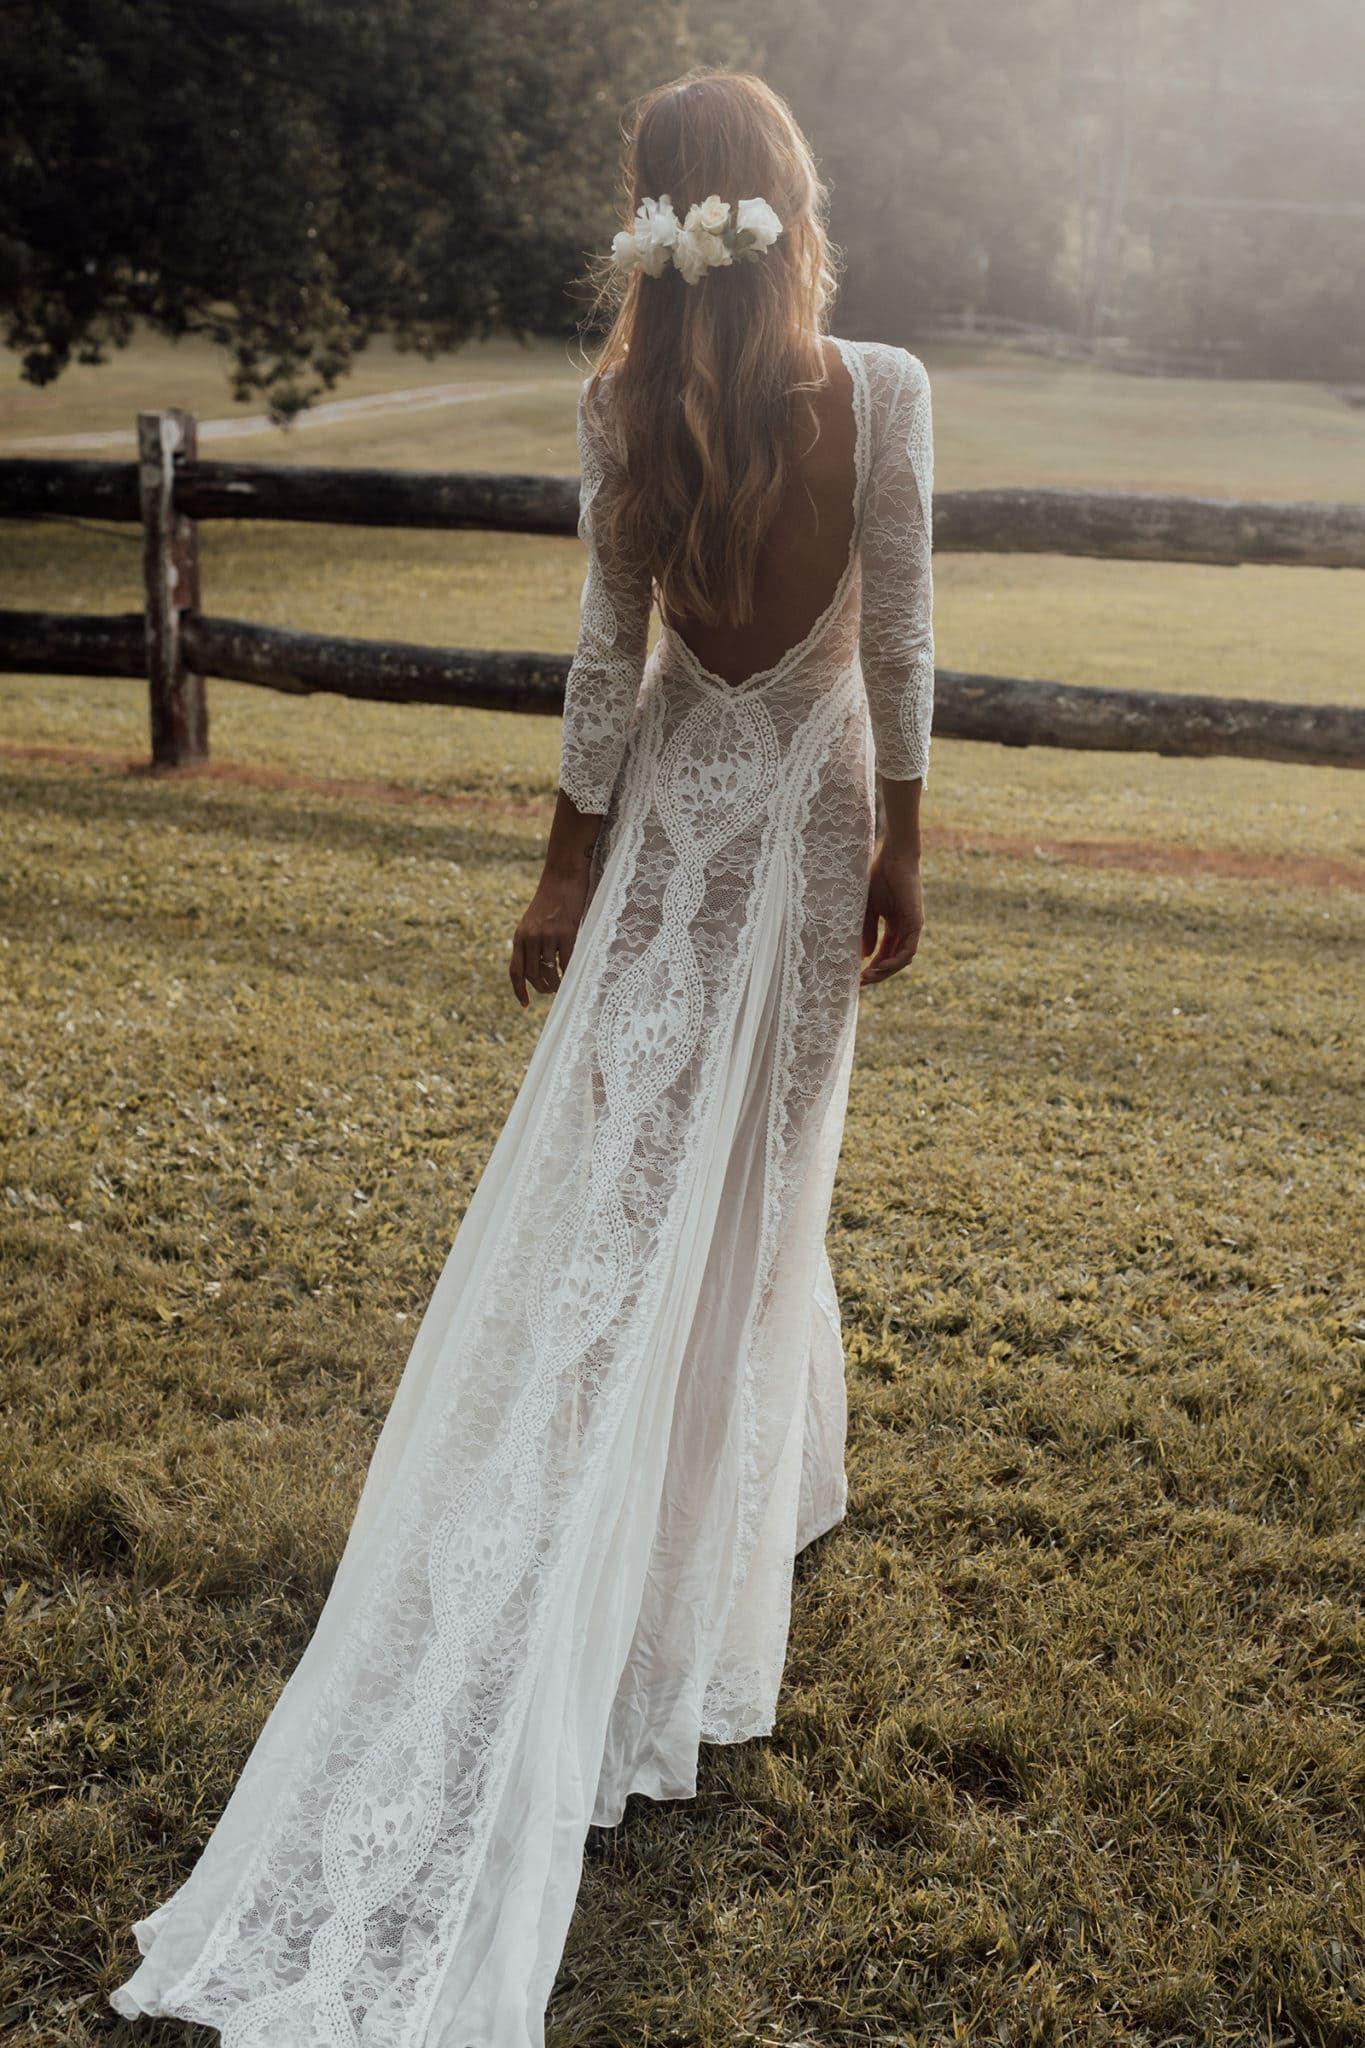 Inca Rtw In 2020 Wedding Dresses Lace Wedding Dress Long Sleeve Wedding Dress Low Back